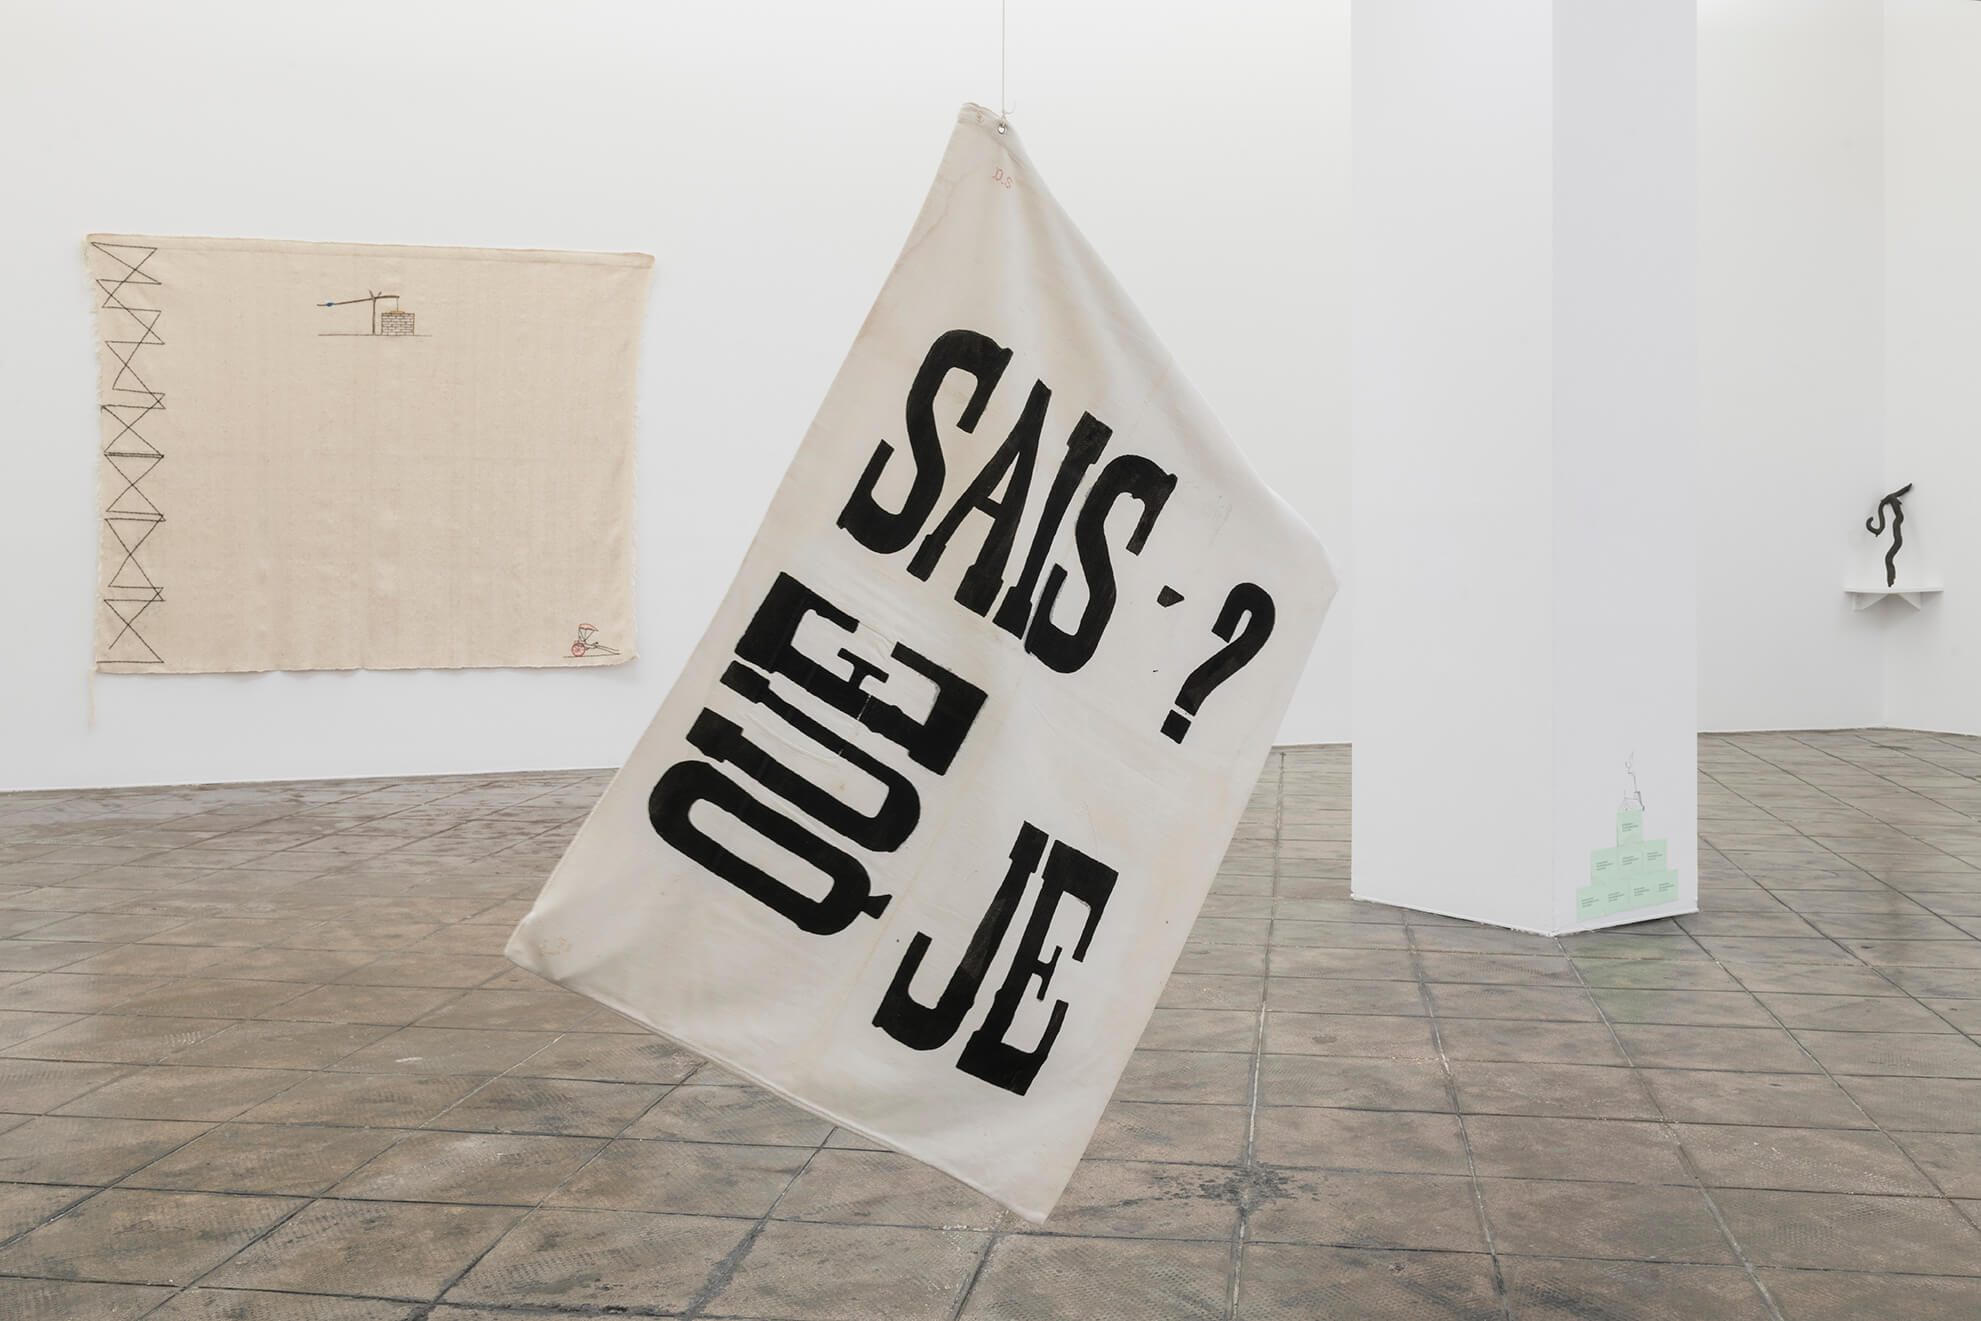 Installation view: Ana Jotta, ProjecteSD | Untitled | ProjecteSD